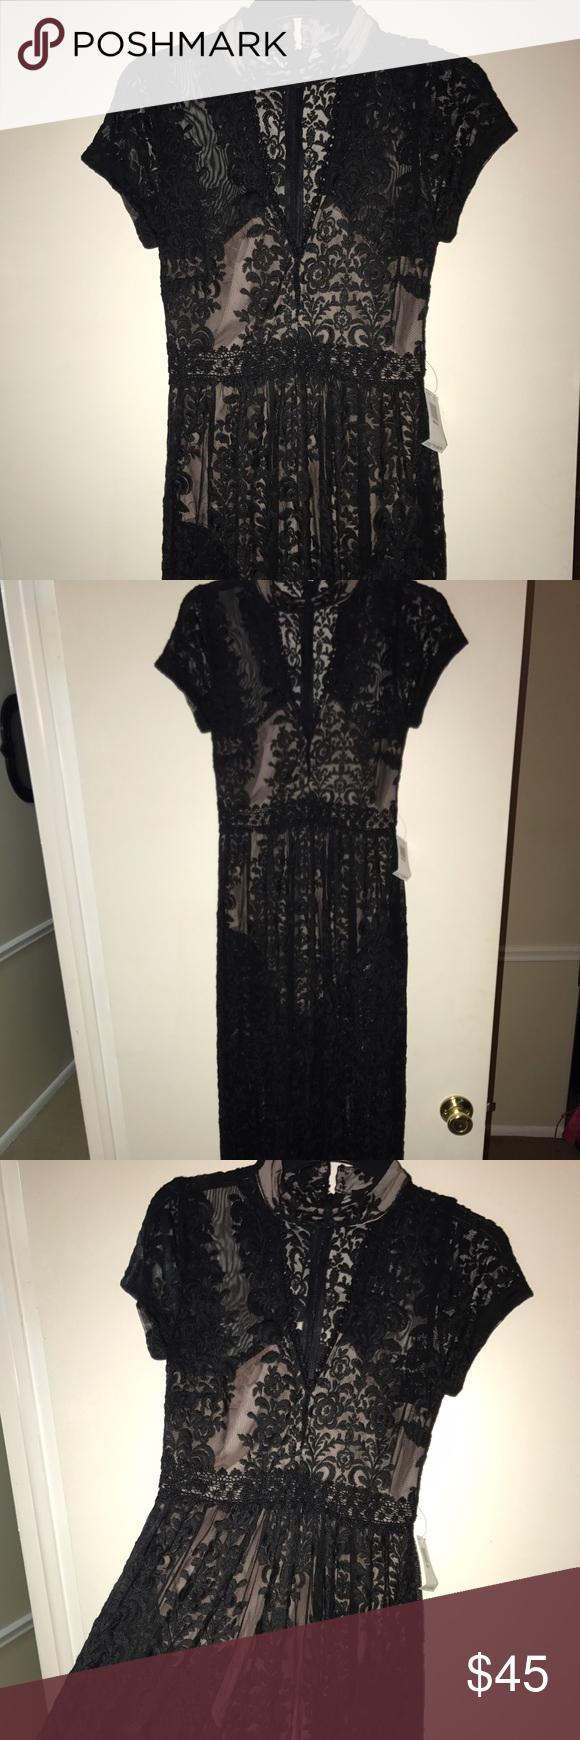 Lace bodysuit long dress black lace dress with body one piece